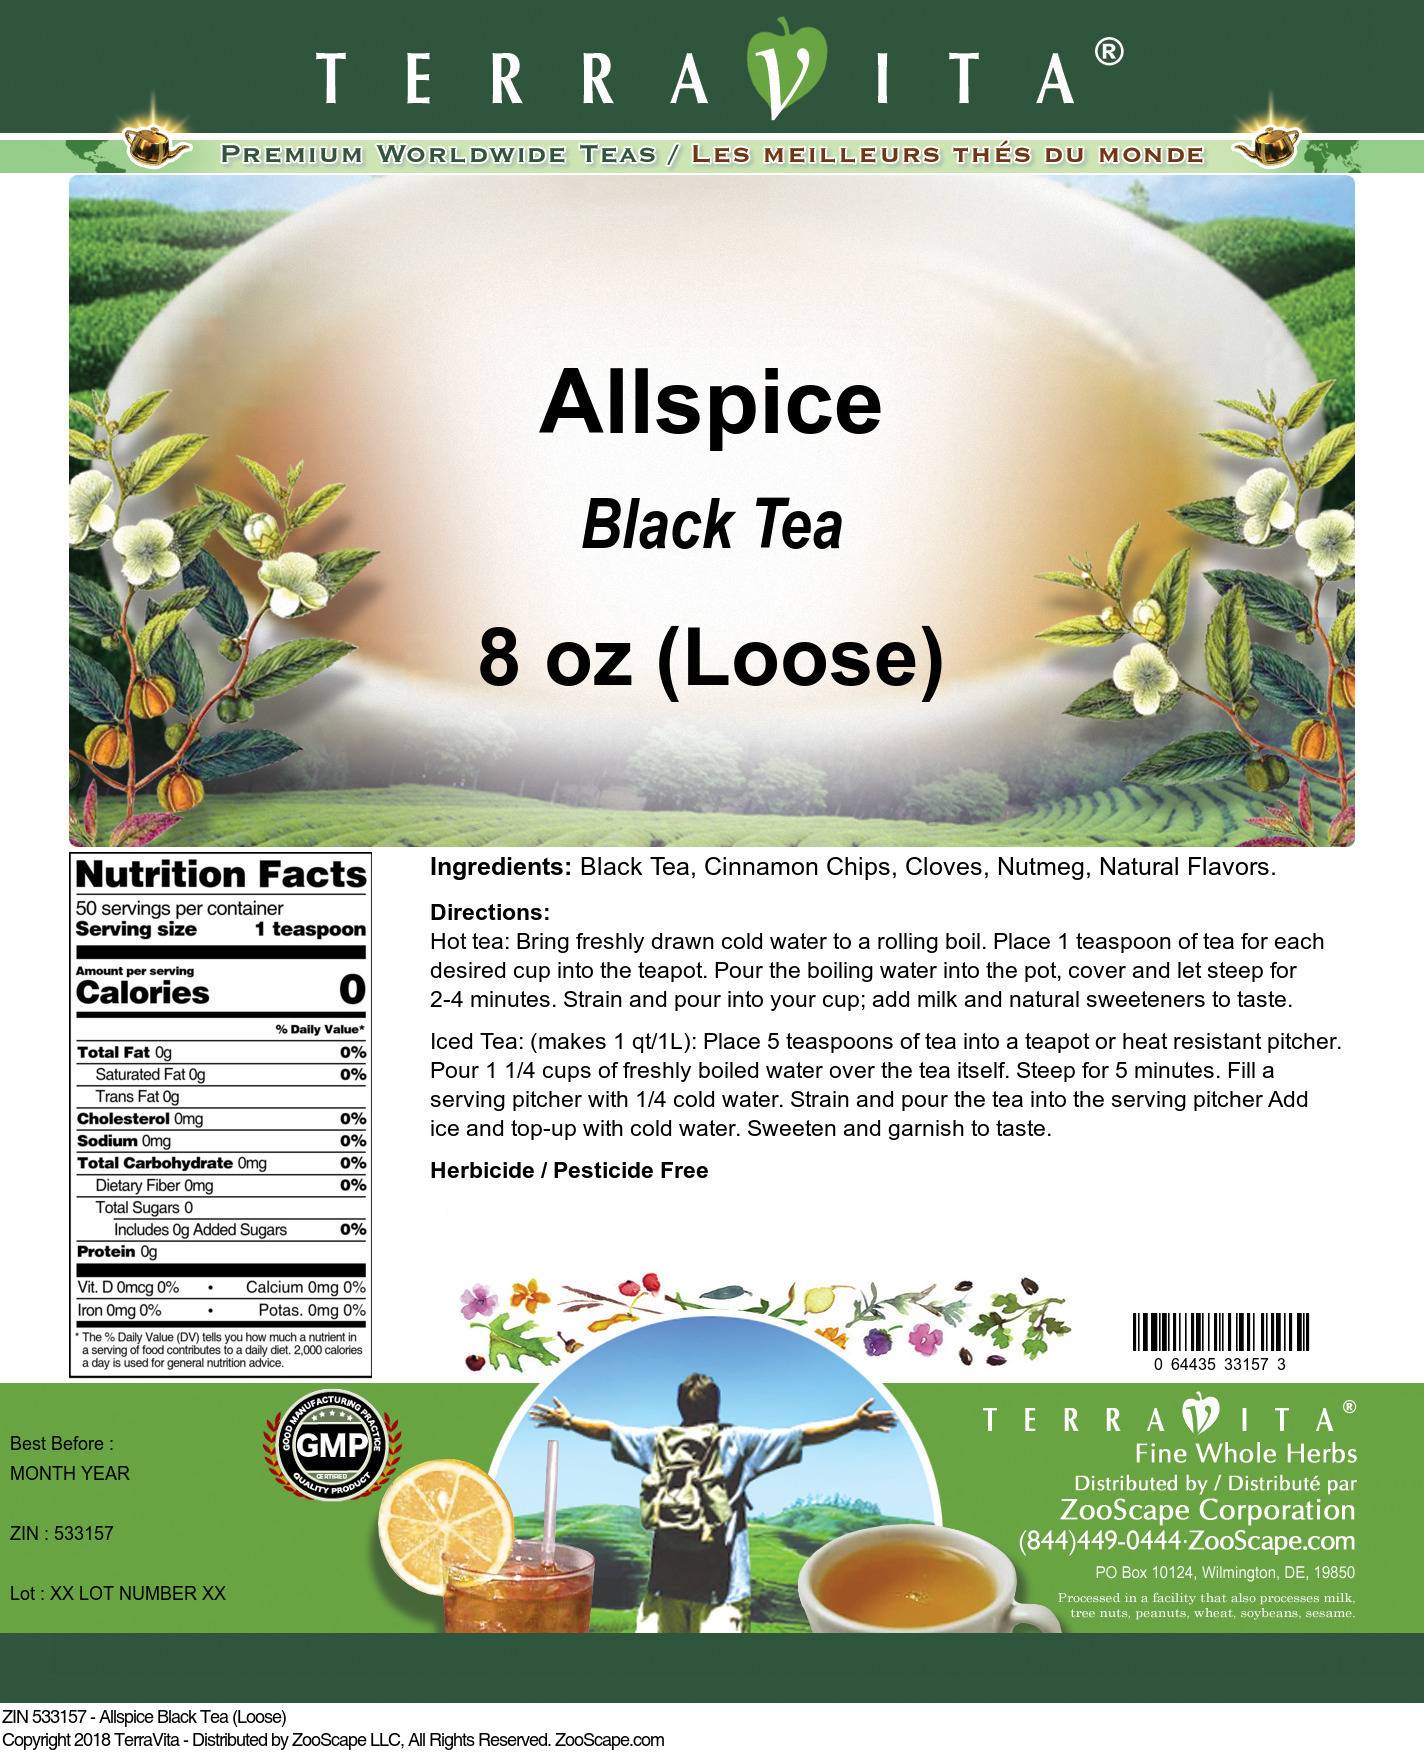 Allspice Black Tea (Loose)